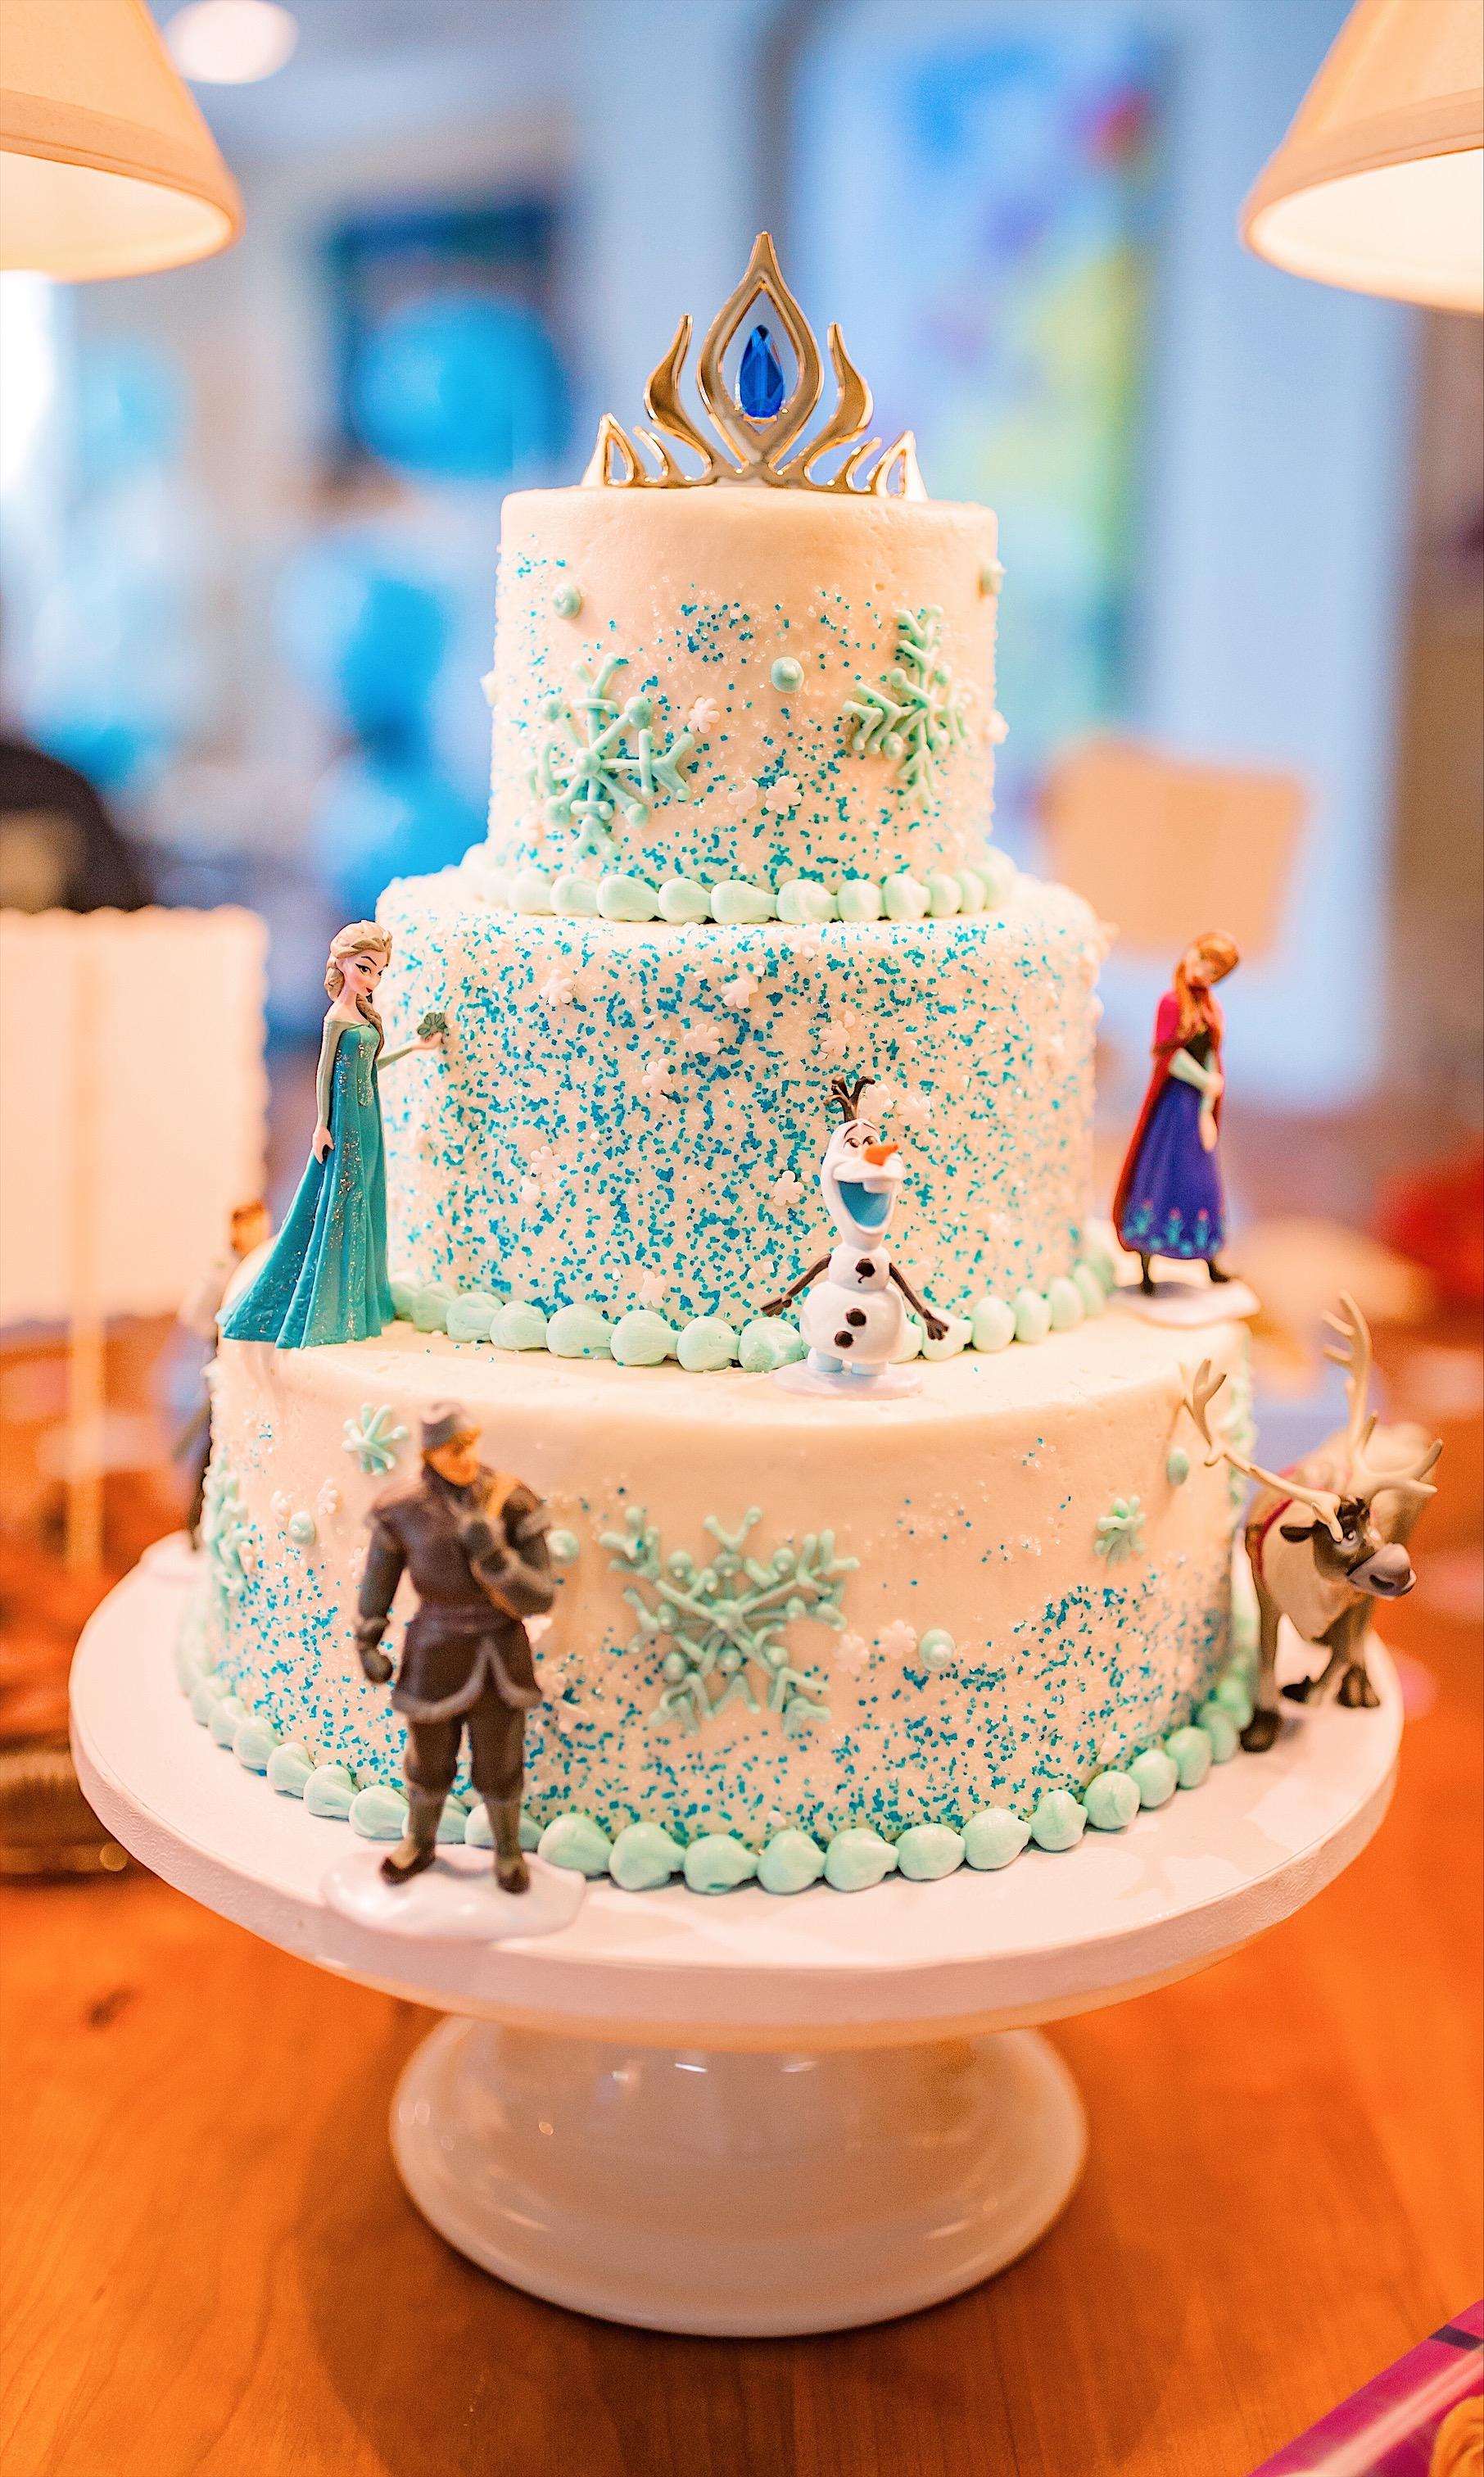 jemma's birthday cake susiecakes frozen